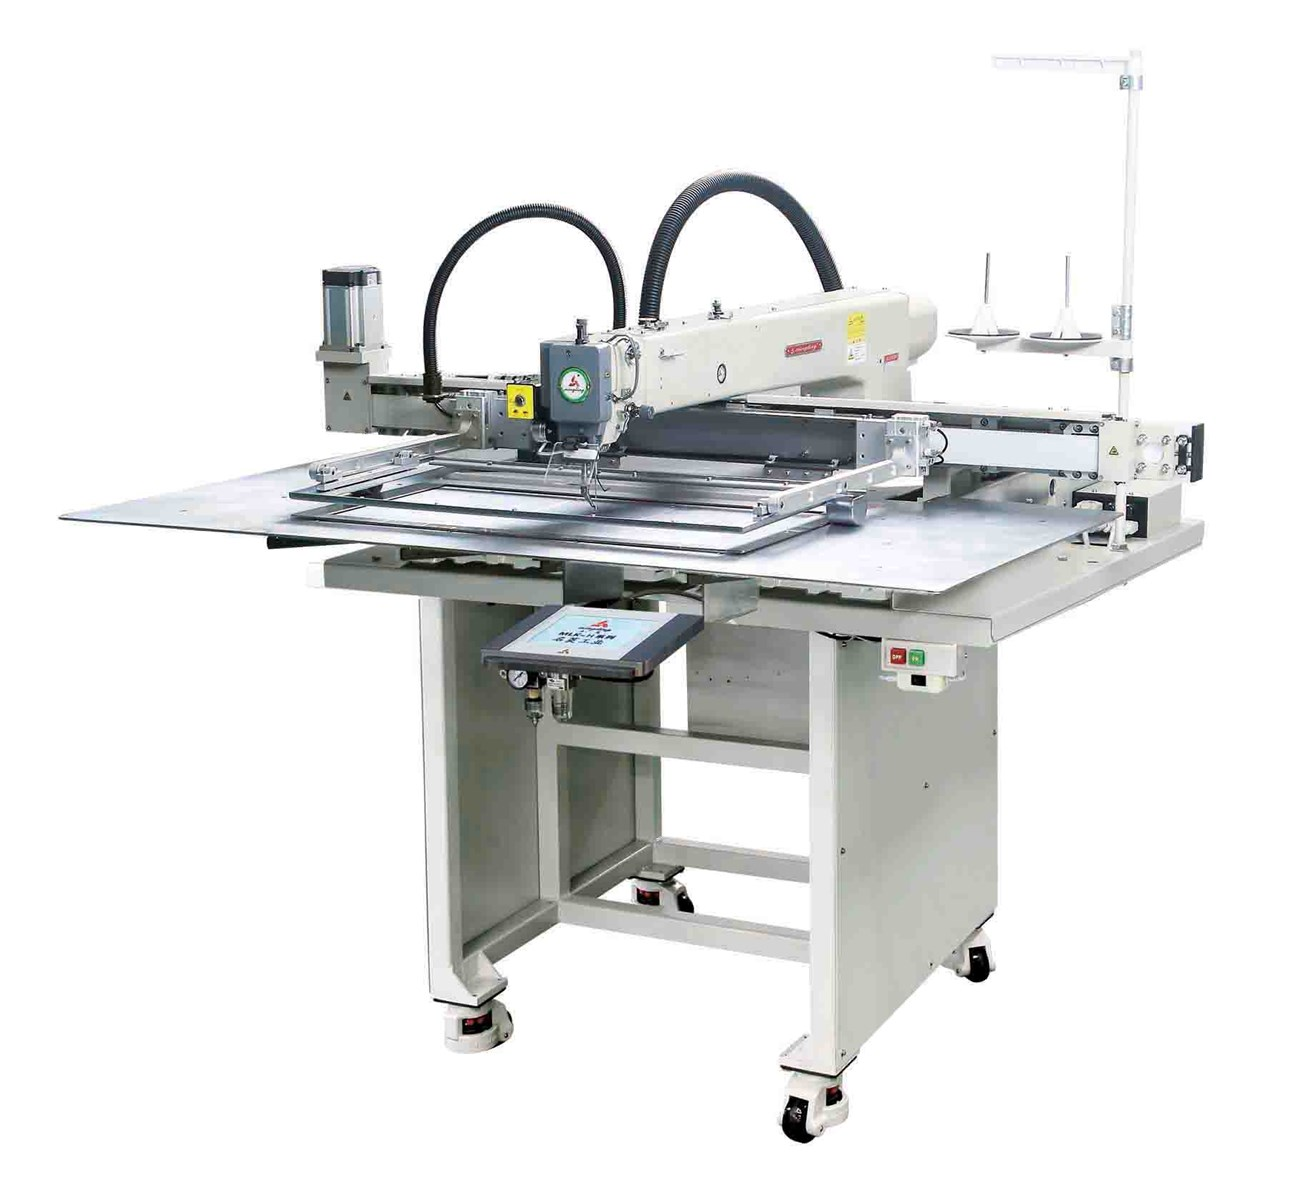 Lockstitch automatic sewing machine MLK6030R